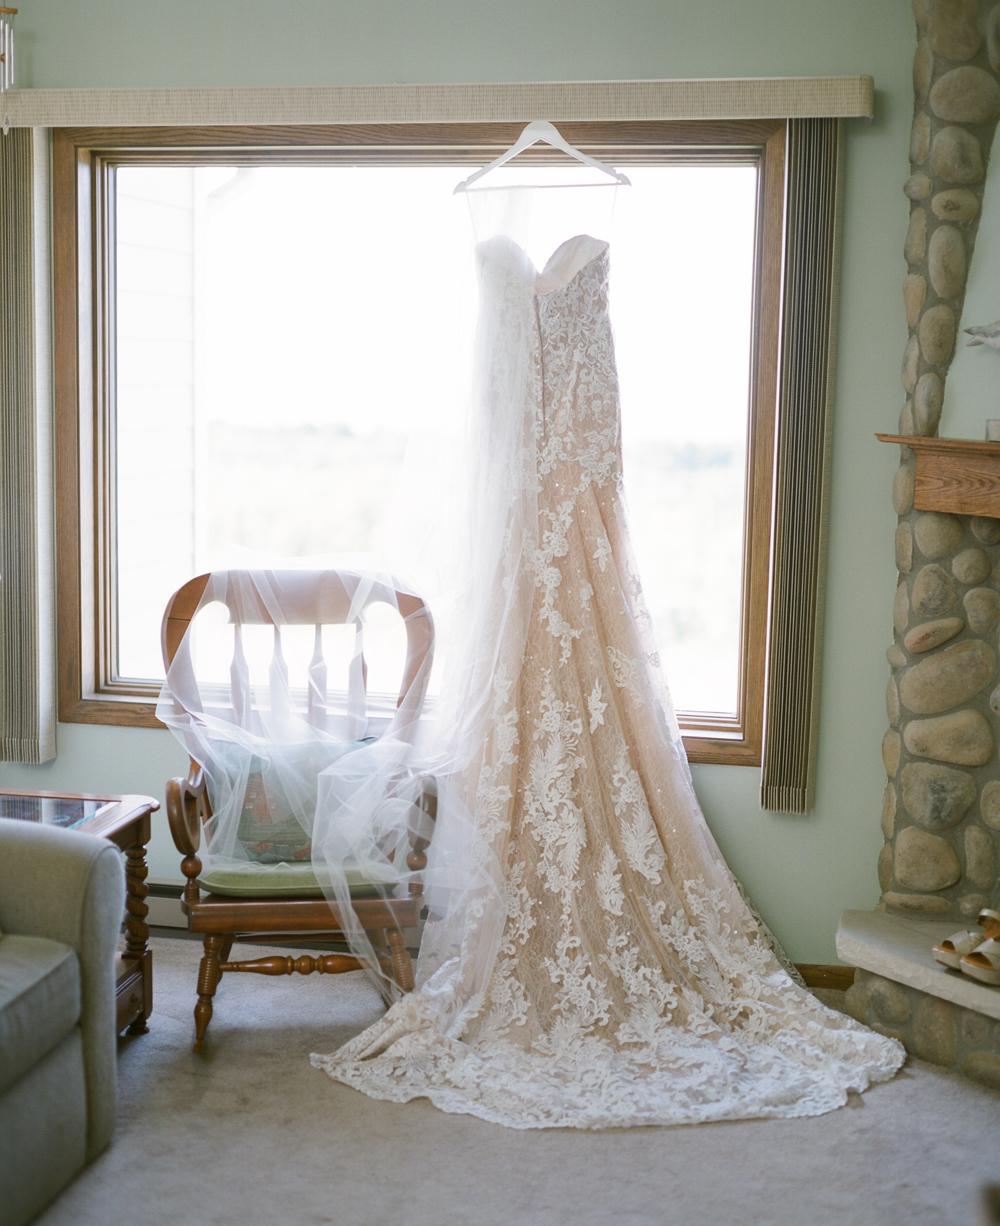 Door County Horseshoe Bay Beach Club Wedding | Ann Marie & Kyle